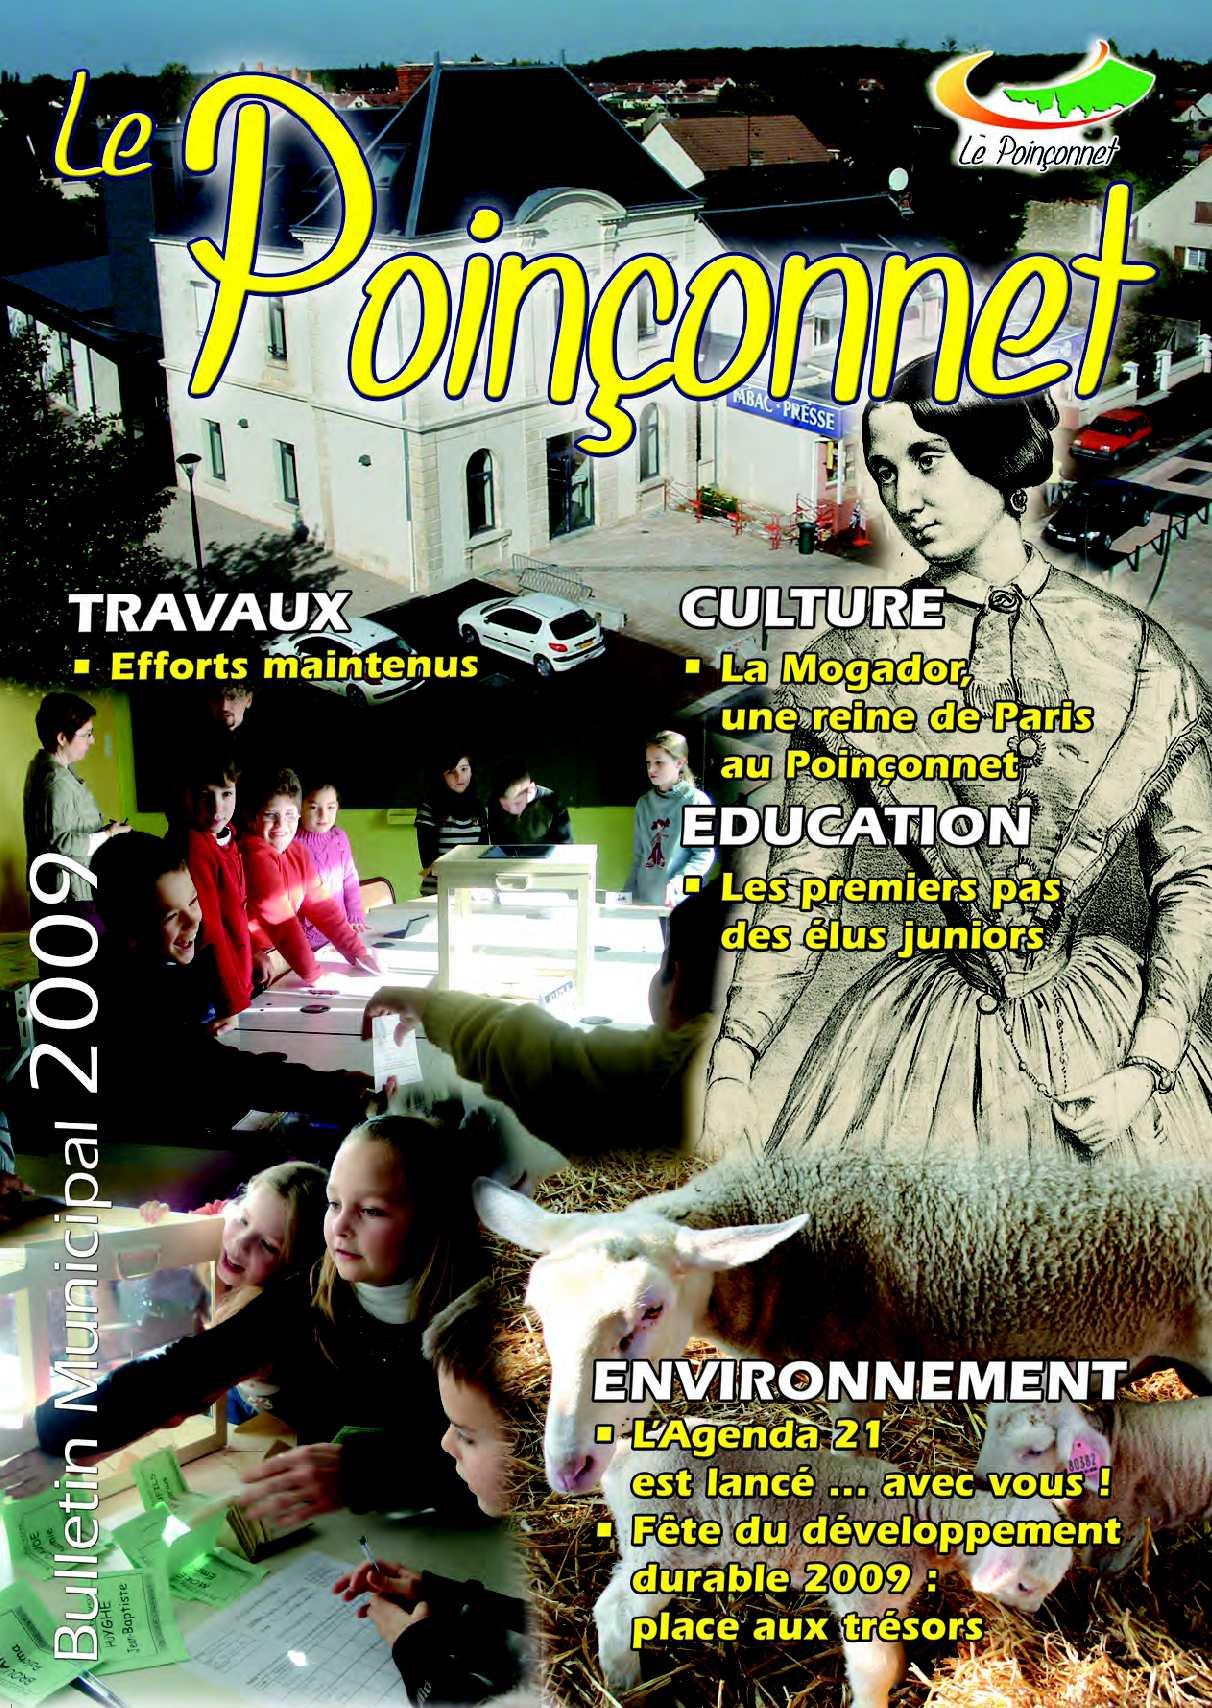 Calam o le poin onnet bulletin municipal 2009 for Balsan le poinconnet